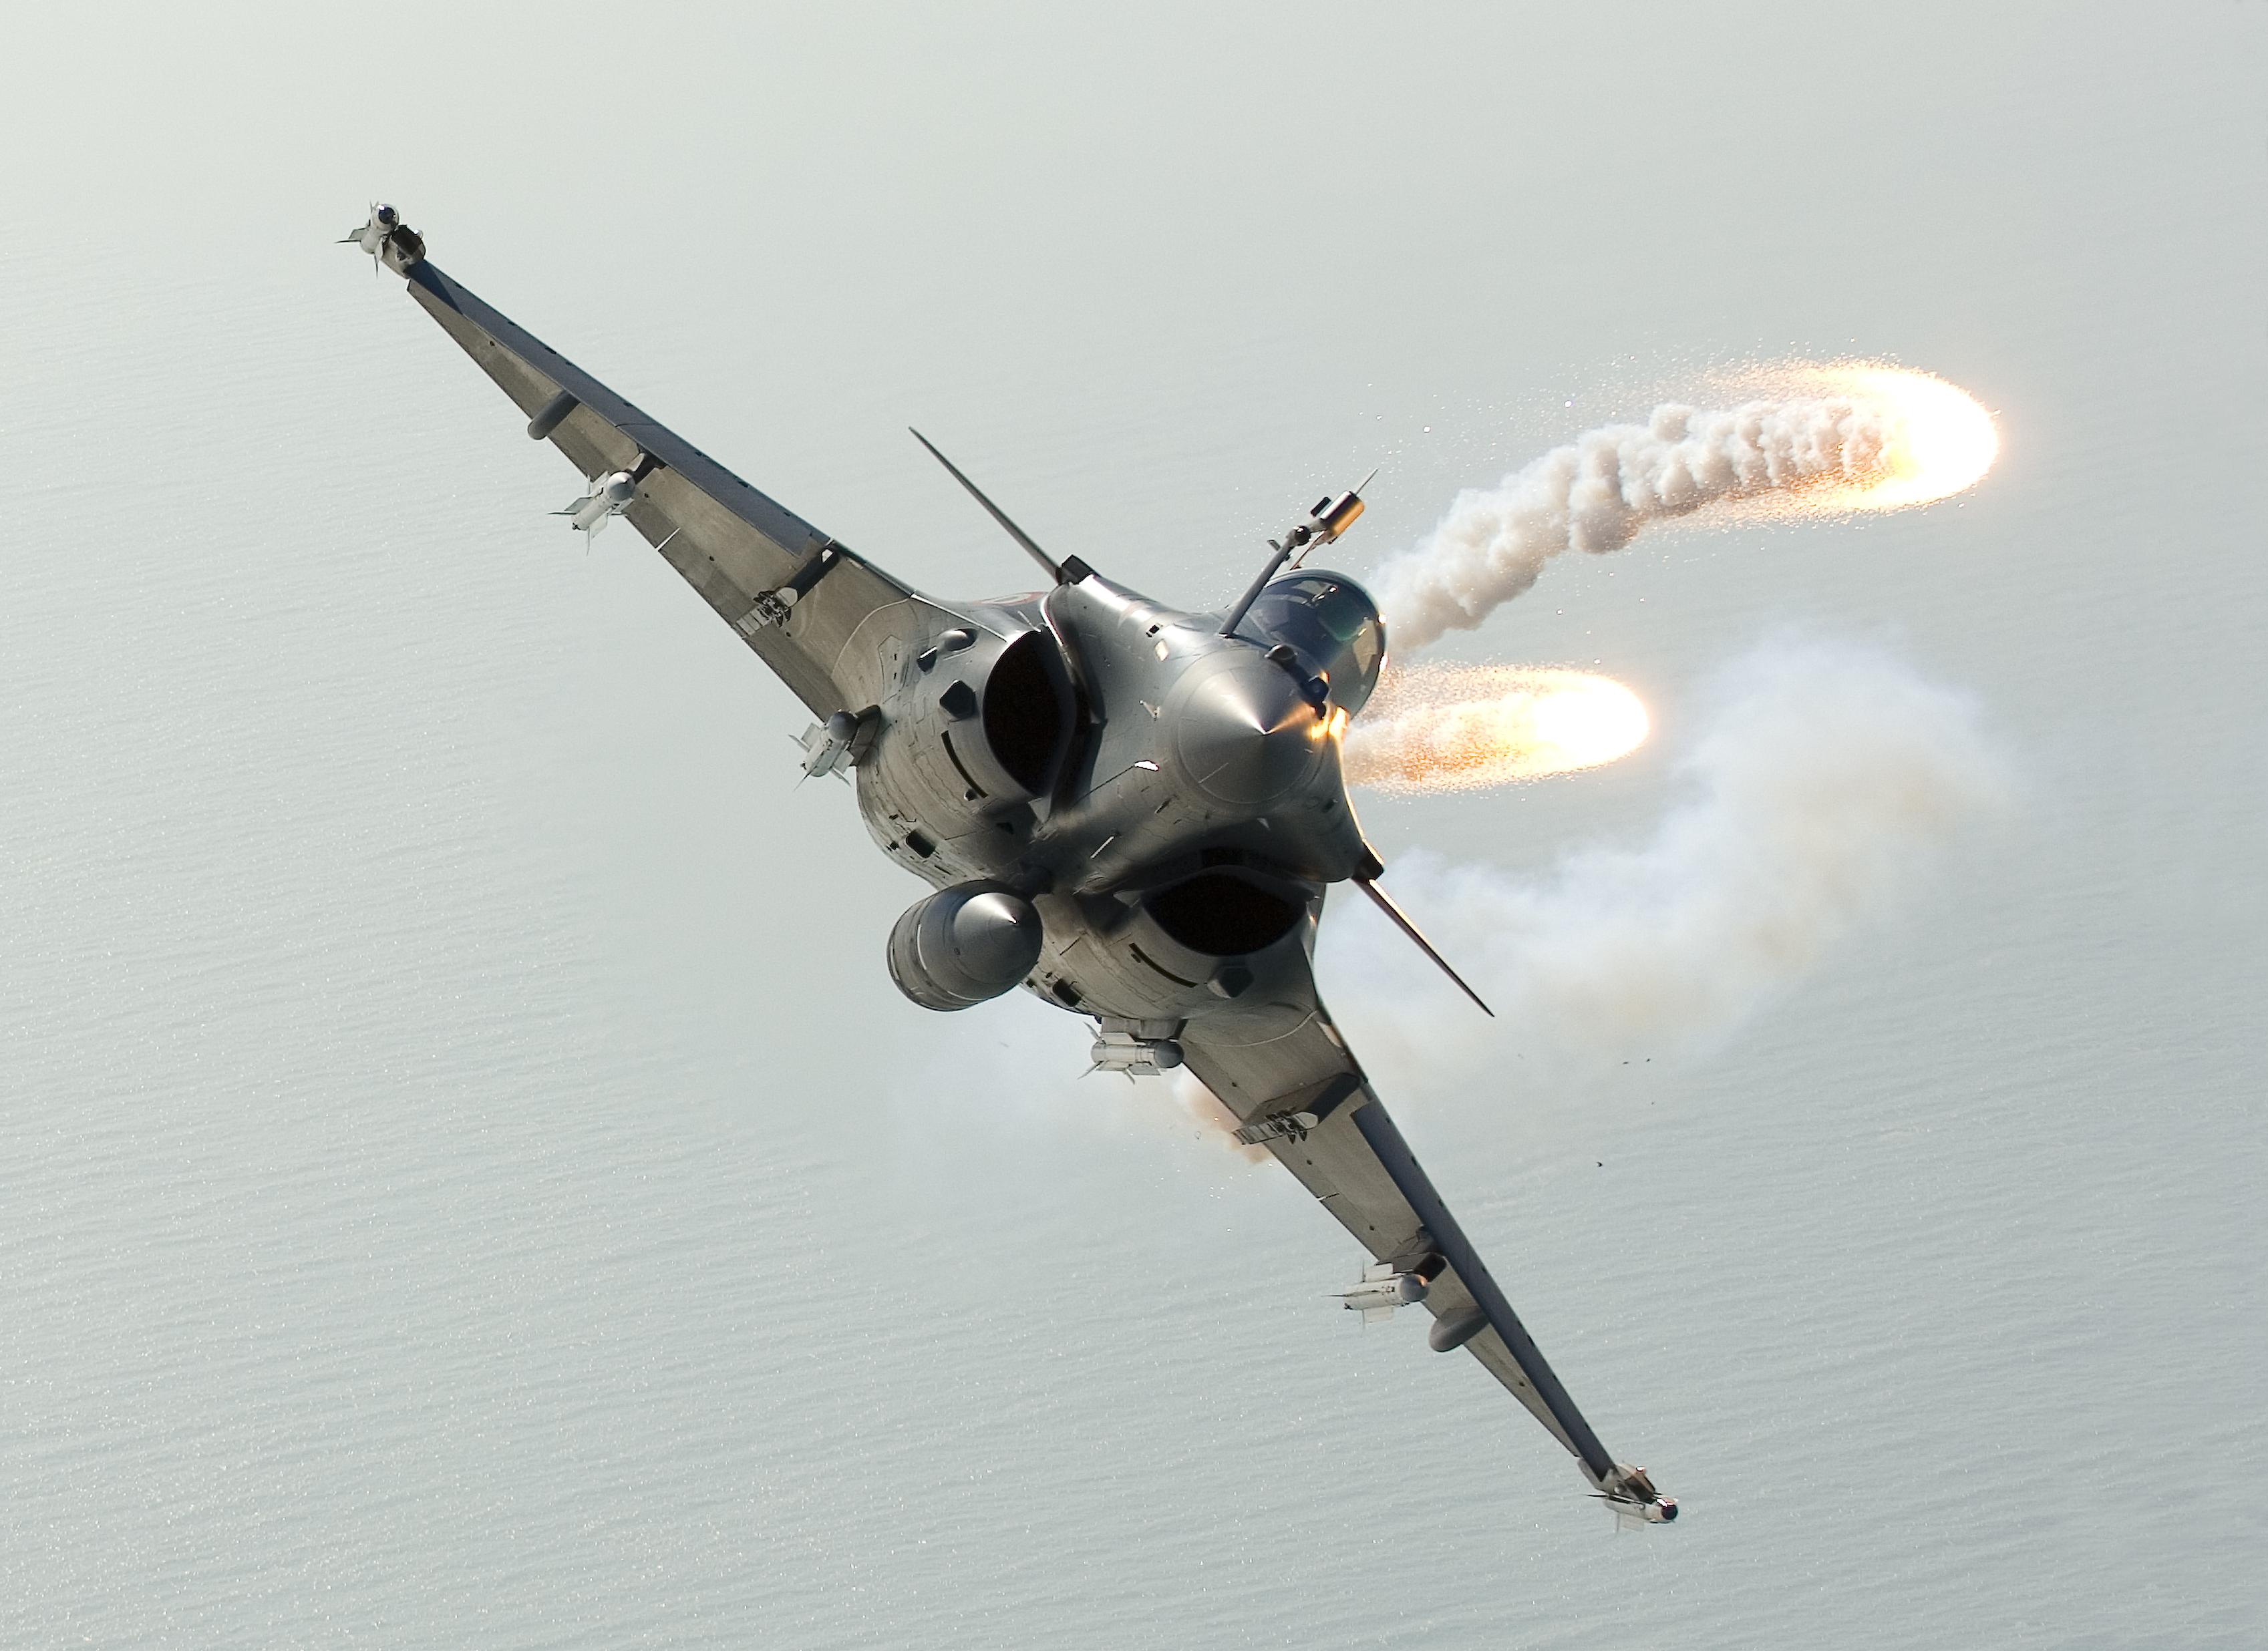 rafale_flares_jet_aircraft_france_dassault_hd-wallpaper-686111